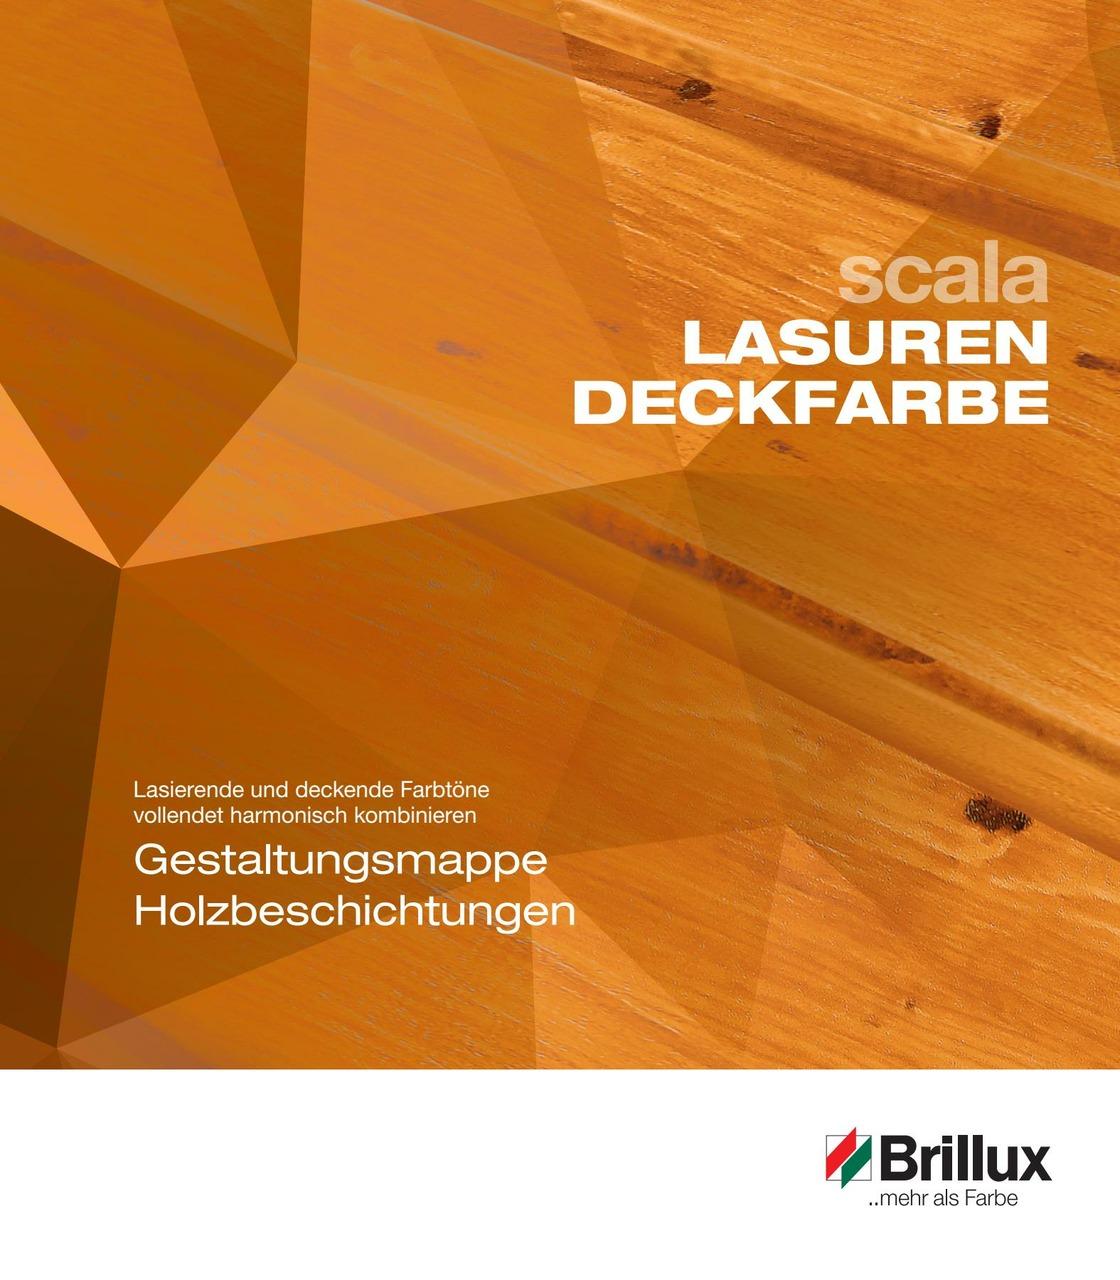 Gestaltungsmappe Holzbeschichtungen